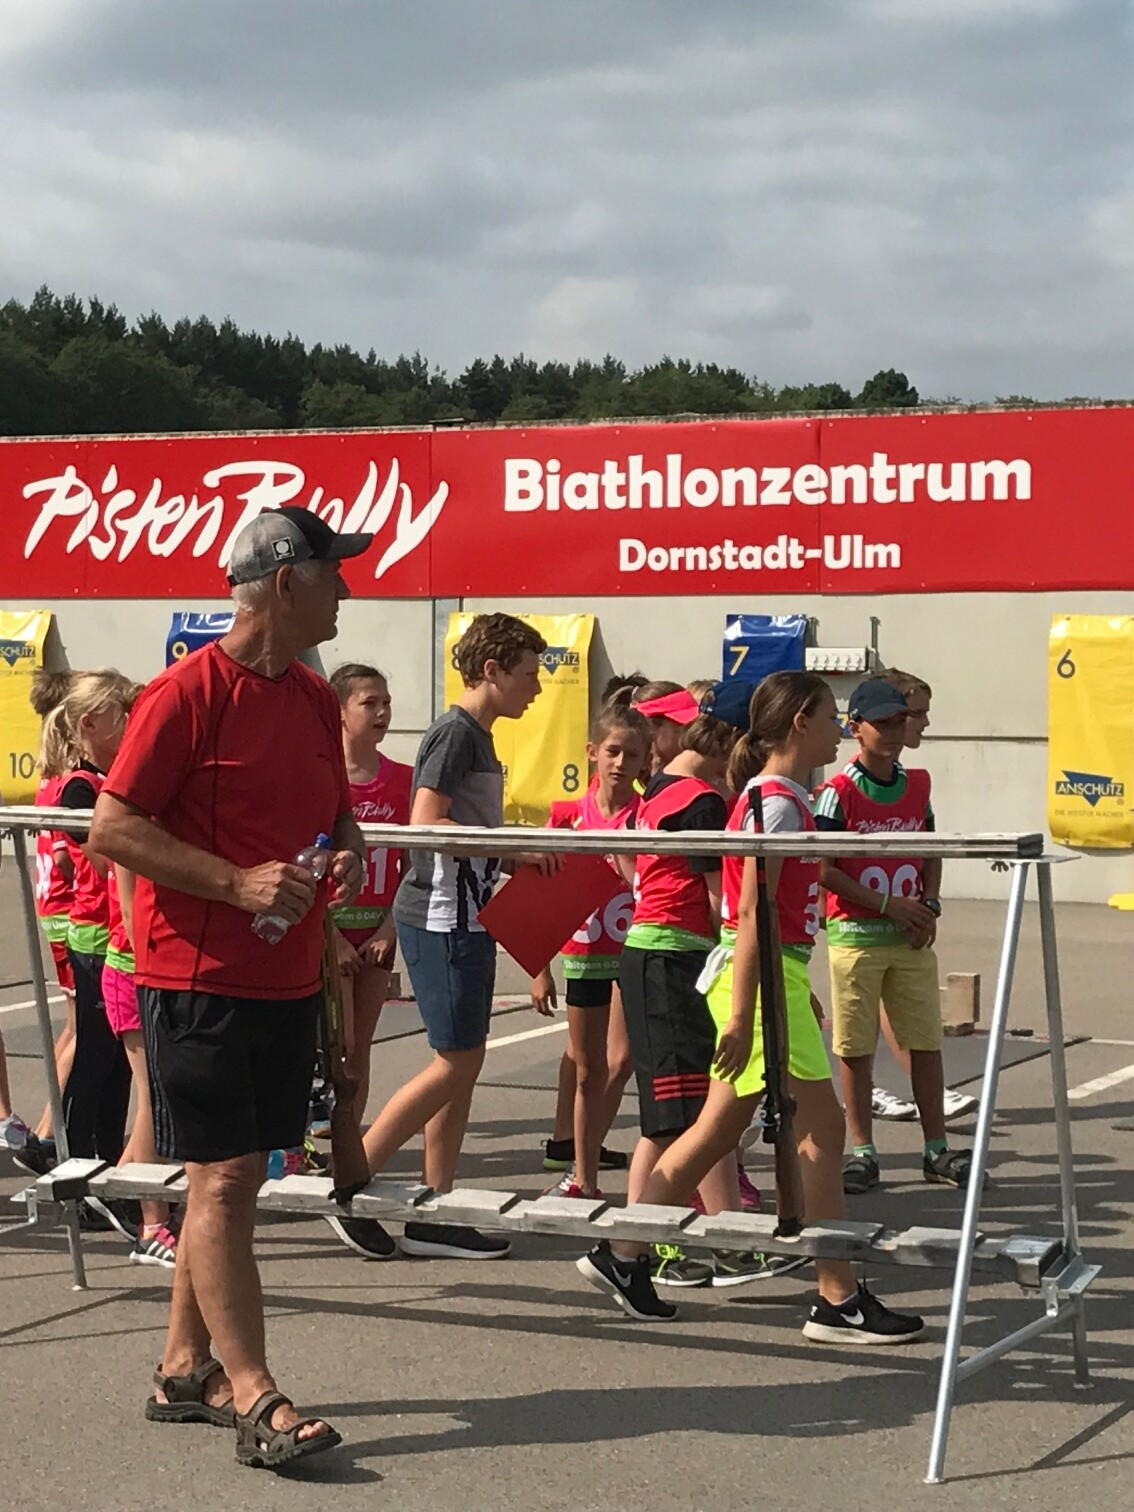 Kässbohrer PistenBully Sponsoring: PistenBully-Biathlonzentrum